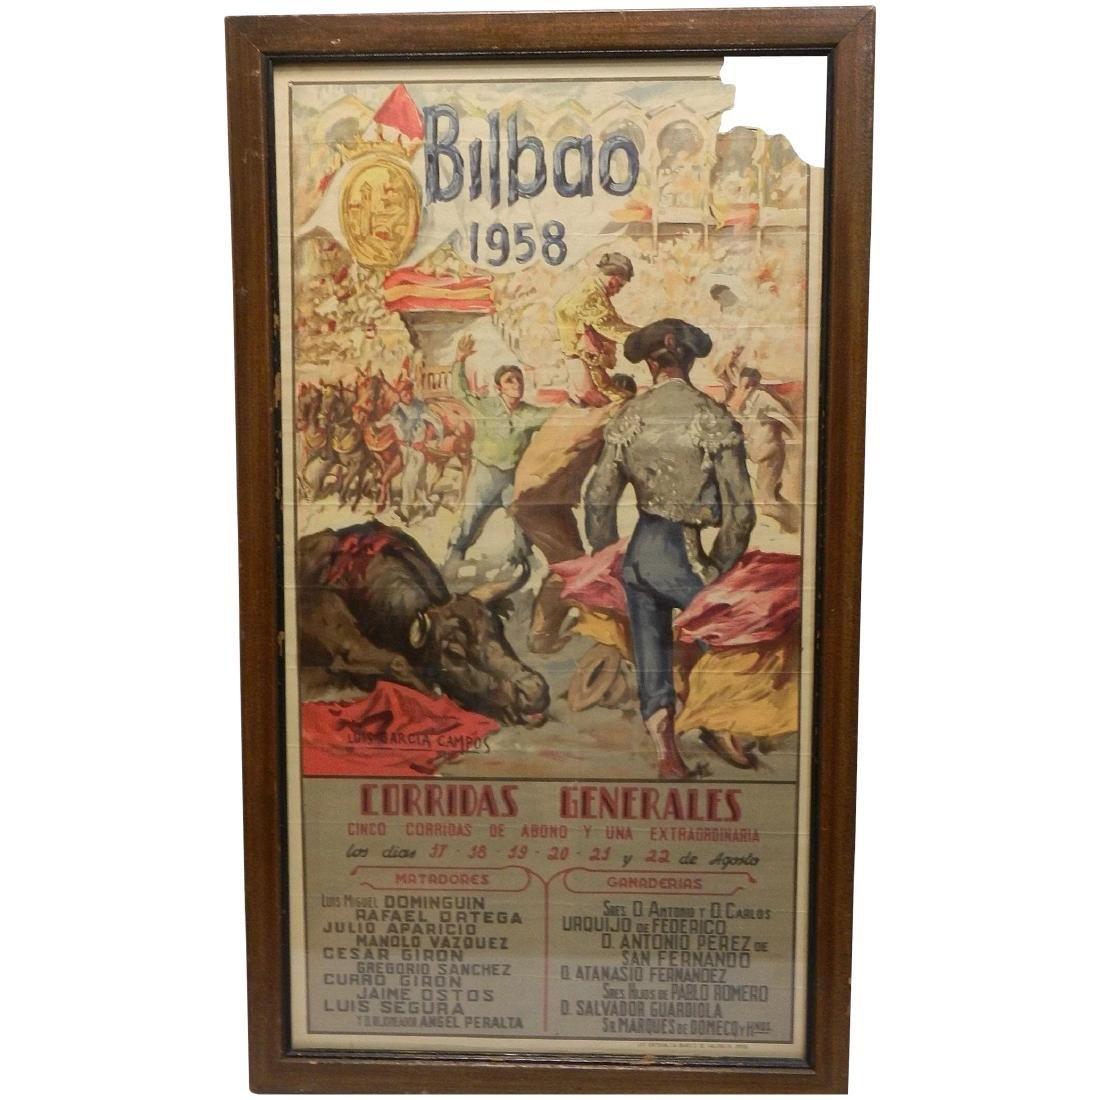 Vintage Original Bullfighting Poster from Bilbao Spain